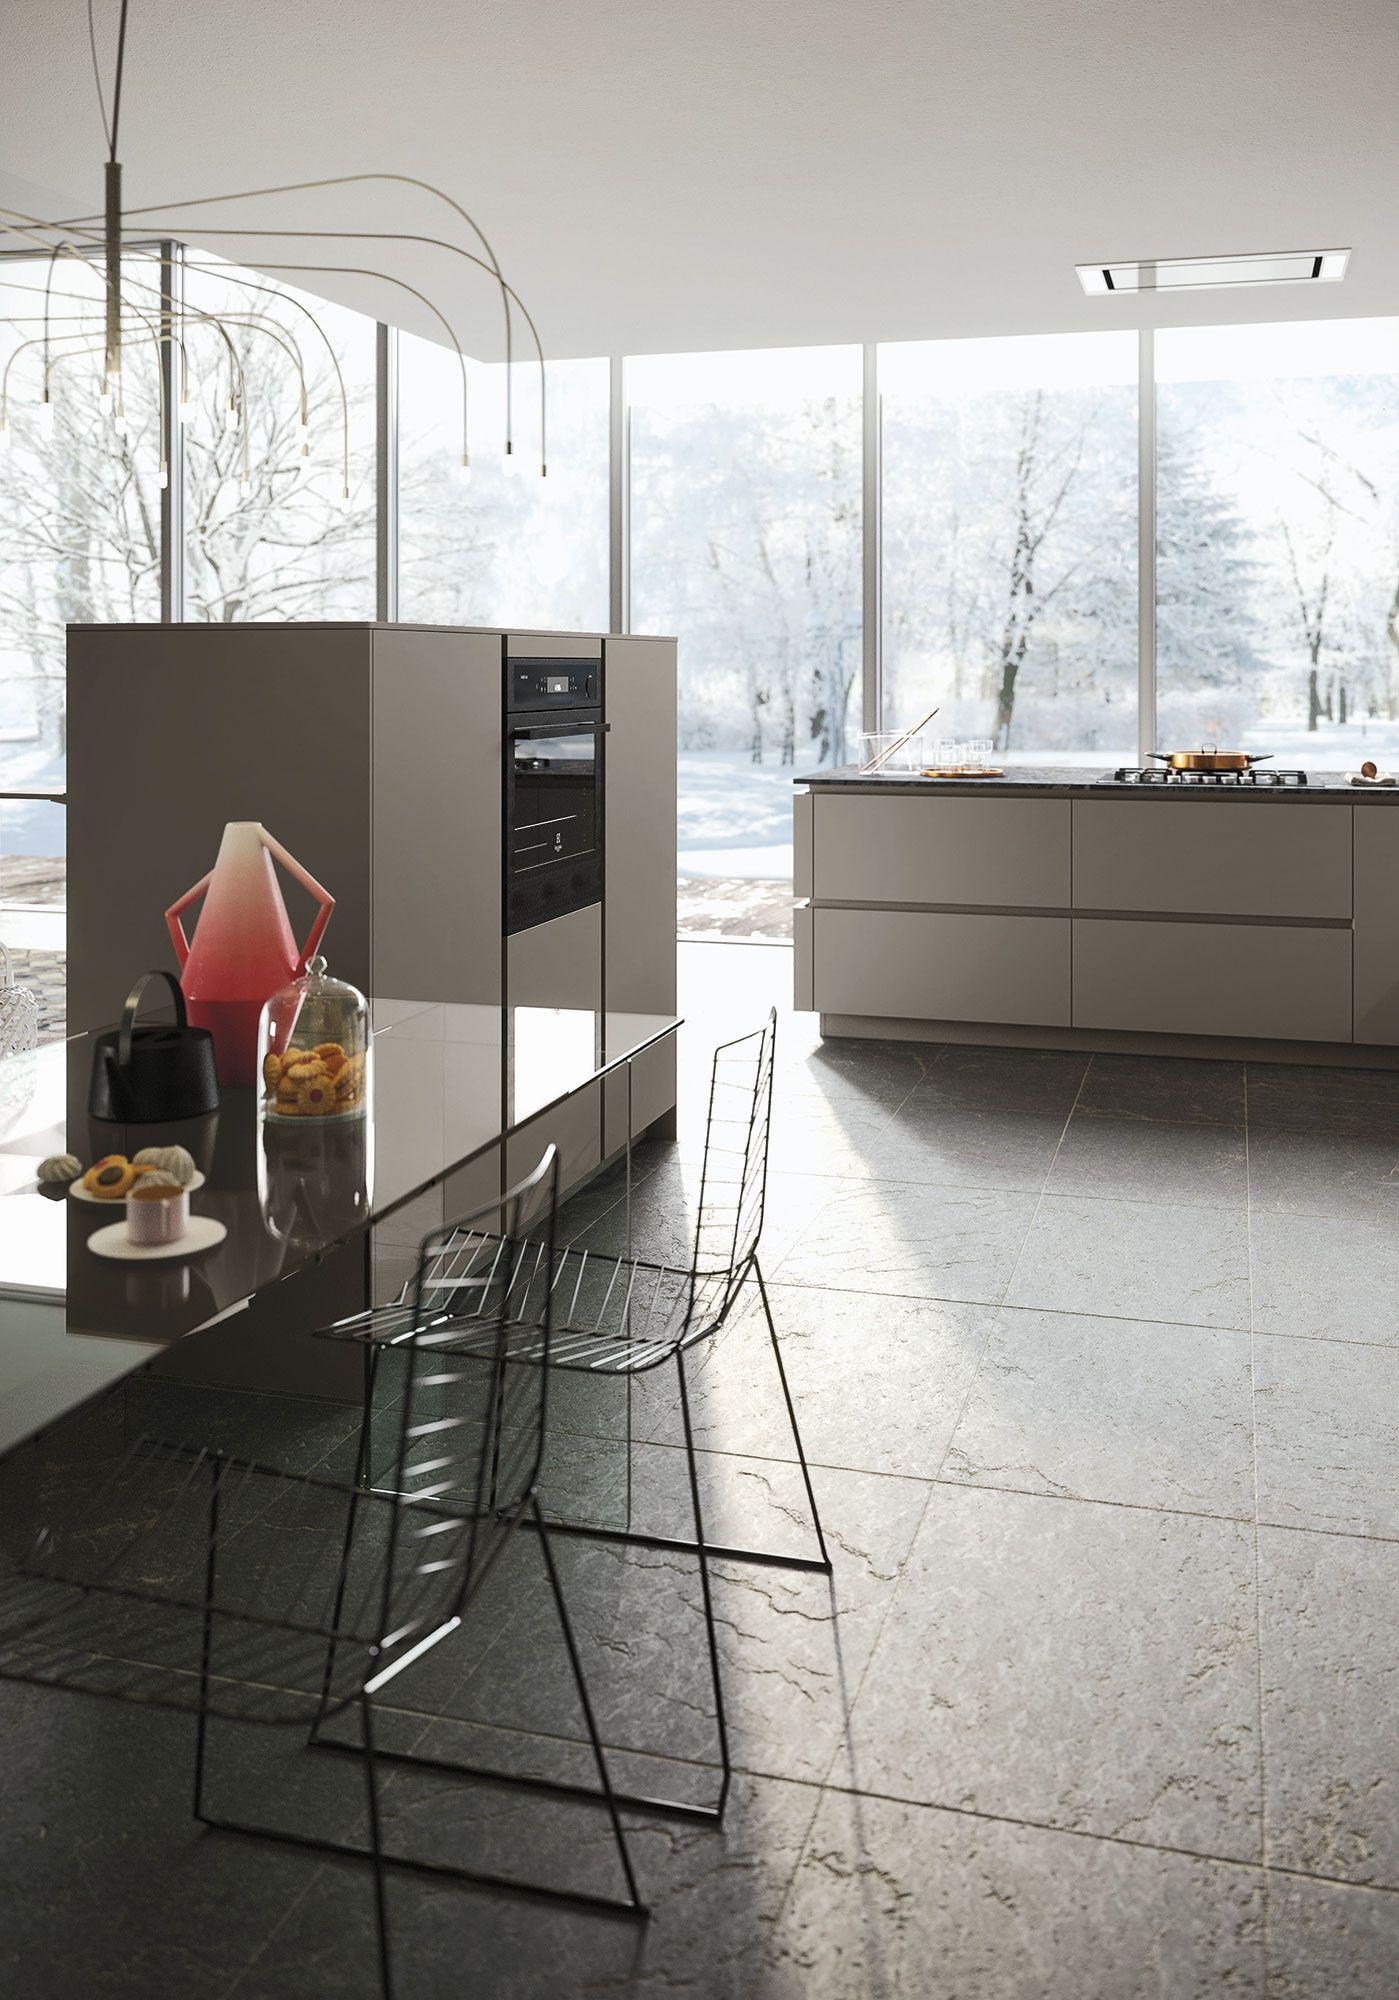 LOOK Cucina con penisola by Snaidero design Michele Marcon   cucine ...